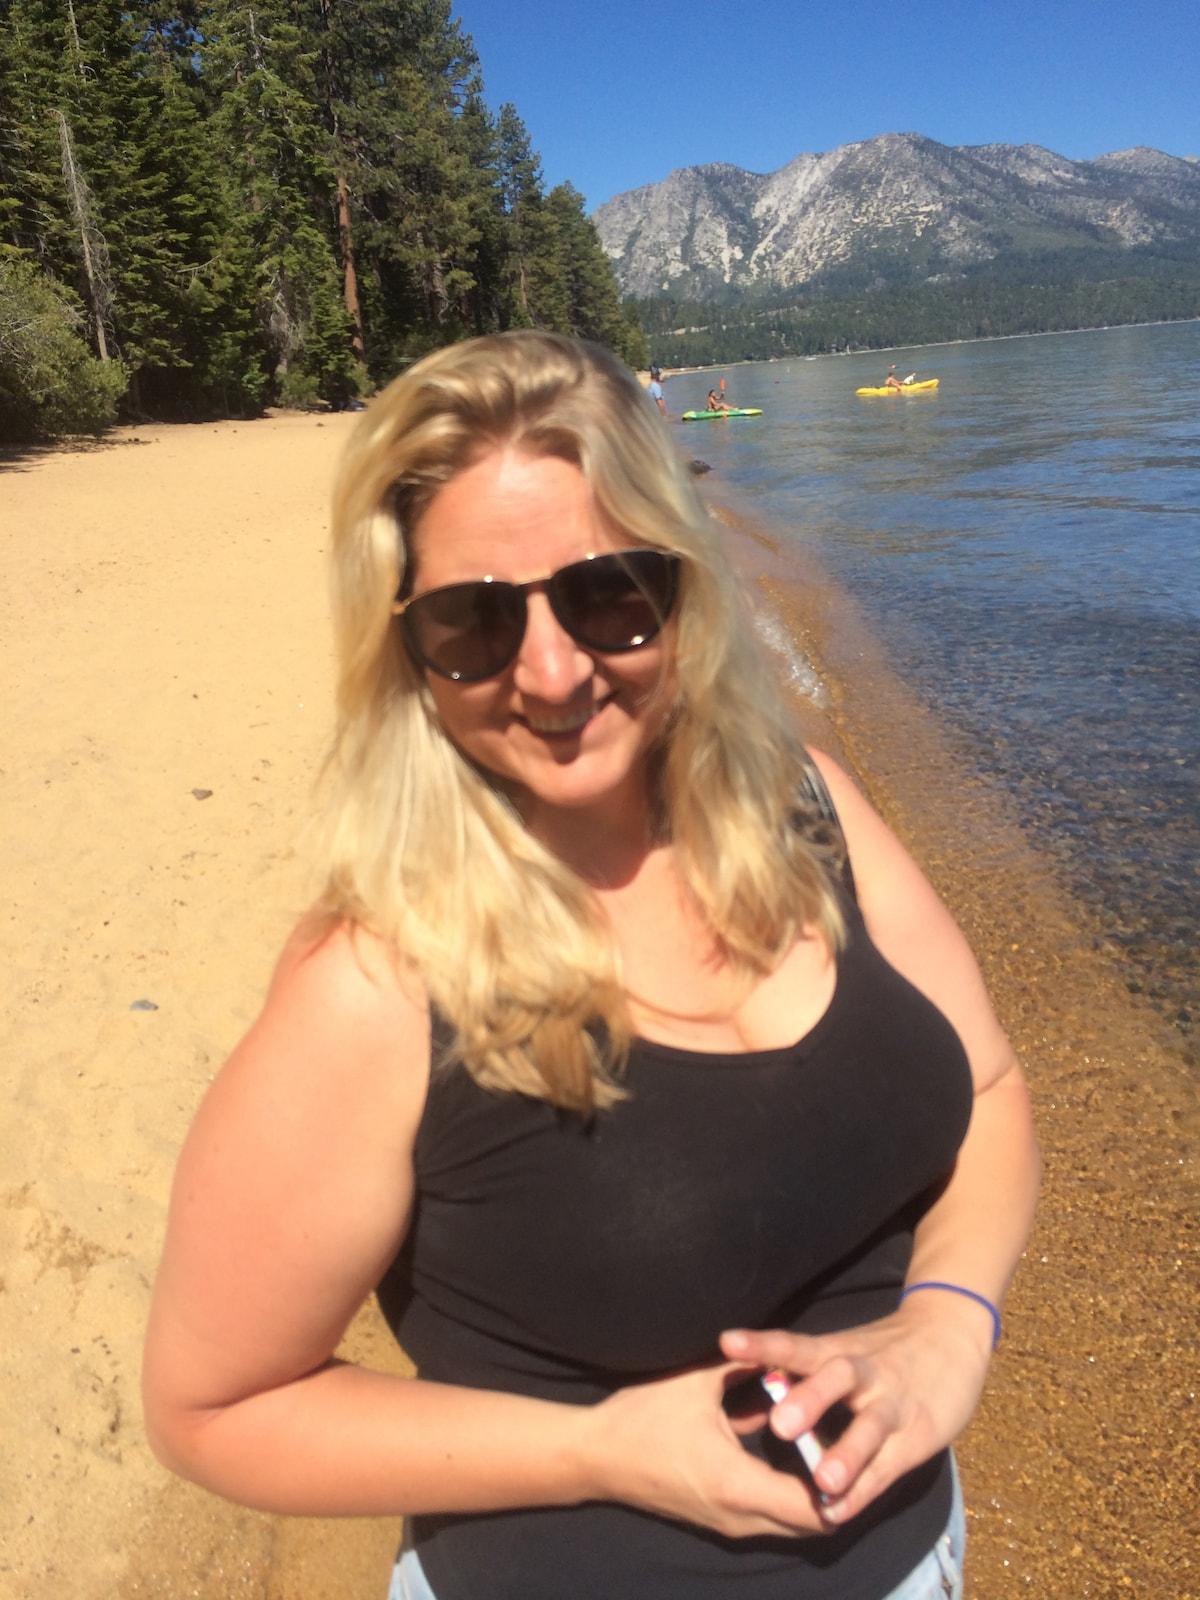 Heidi from Ojai